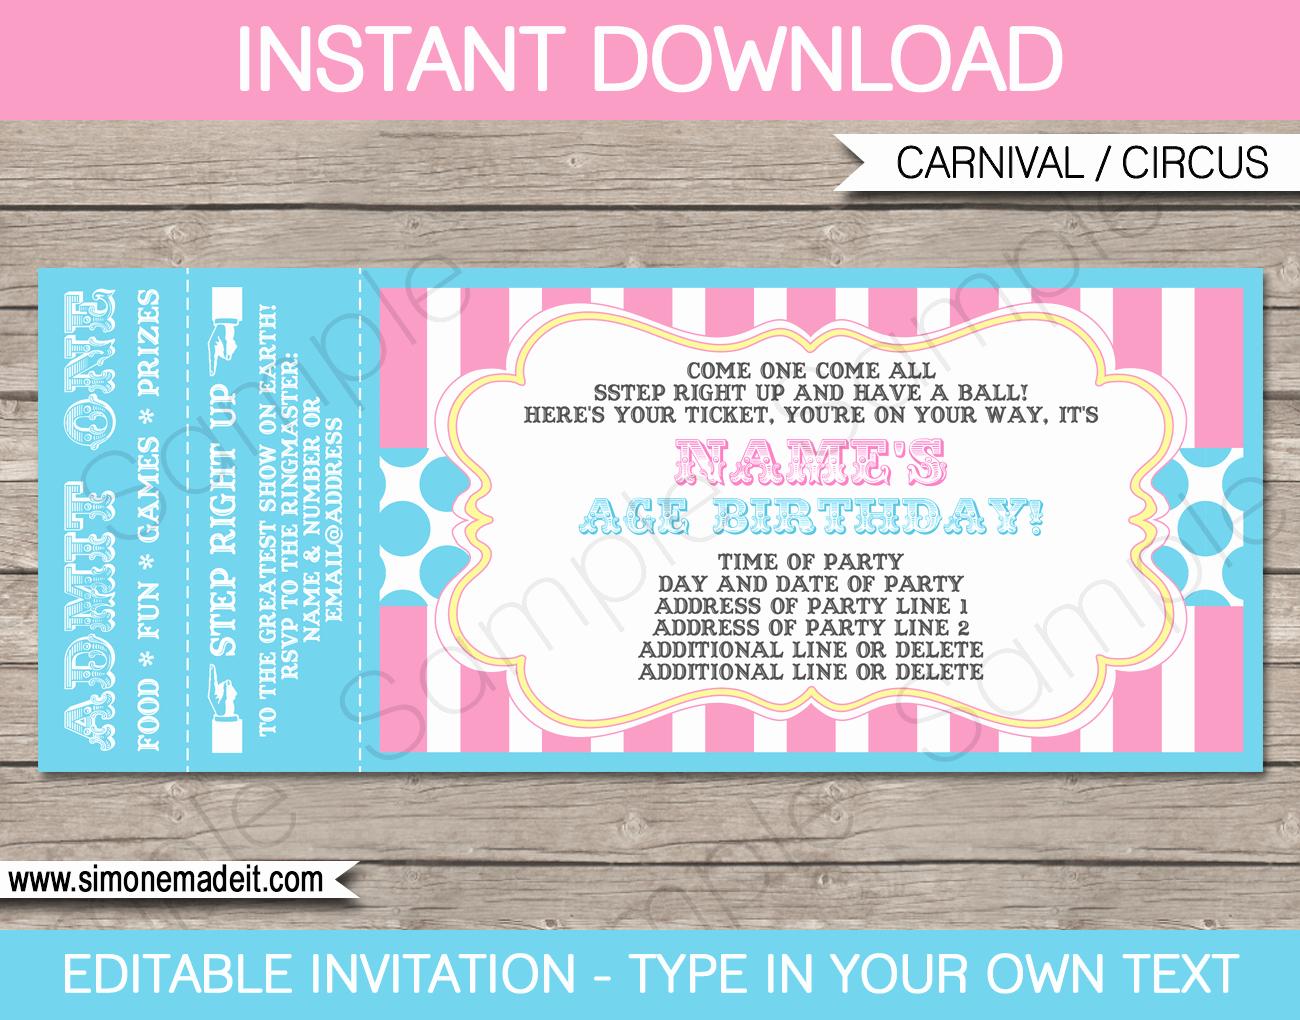 Circus Ticket Invitation Template Free Unique Carnival Party Ticket Invitations Template